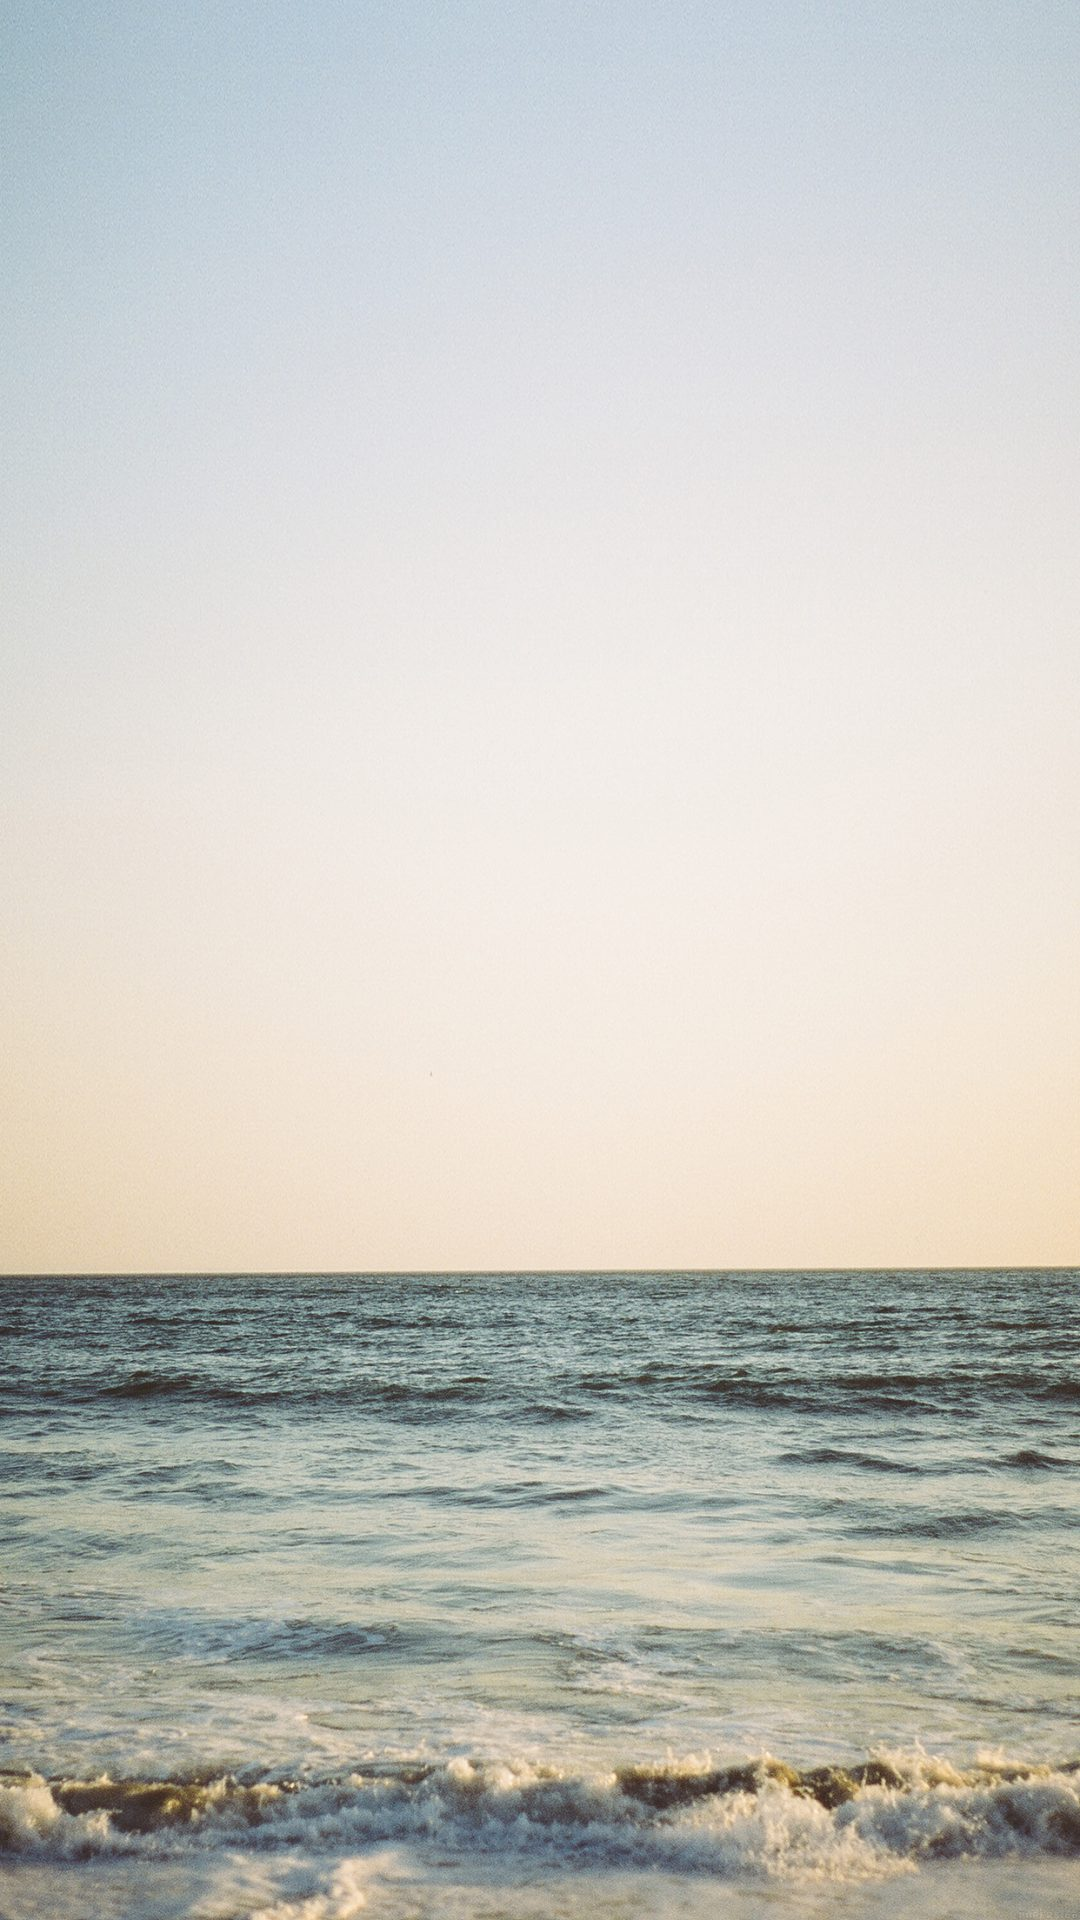 Ocean View Jay Mantri Nature